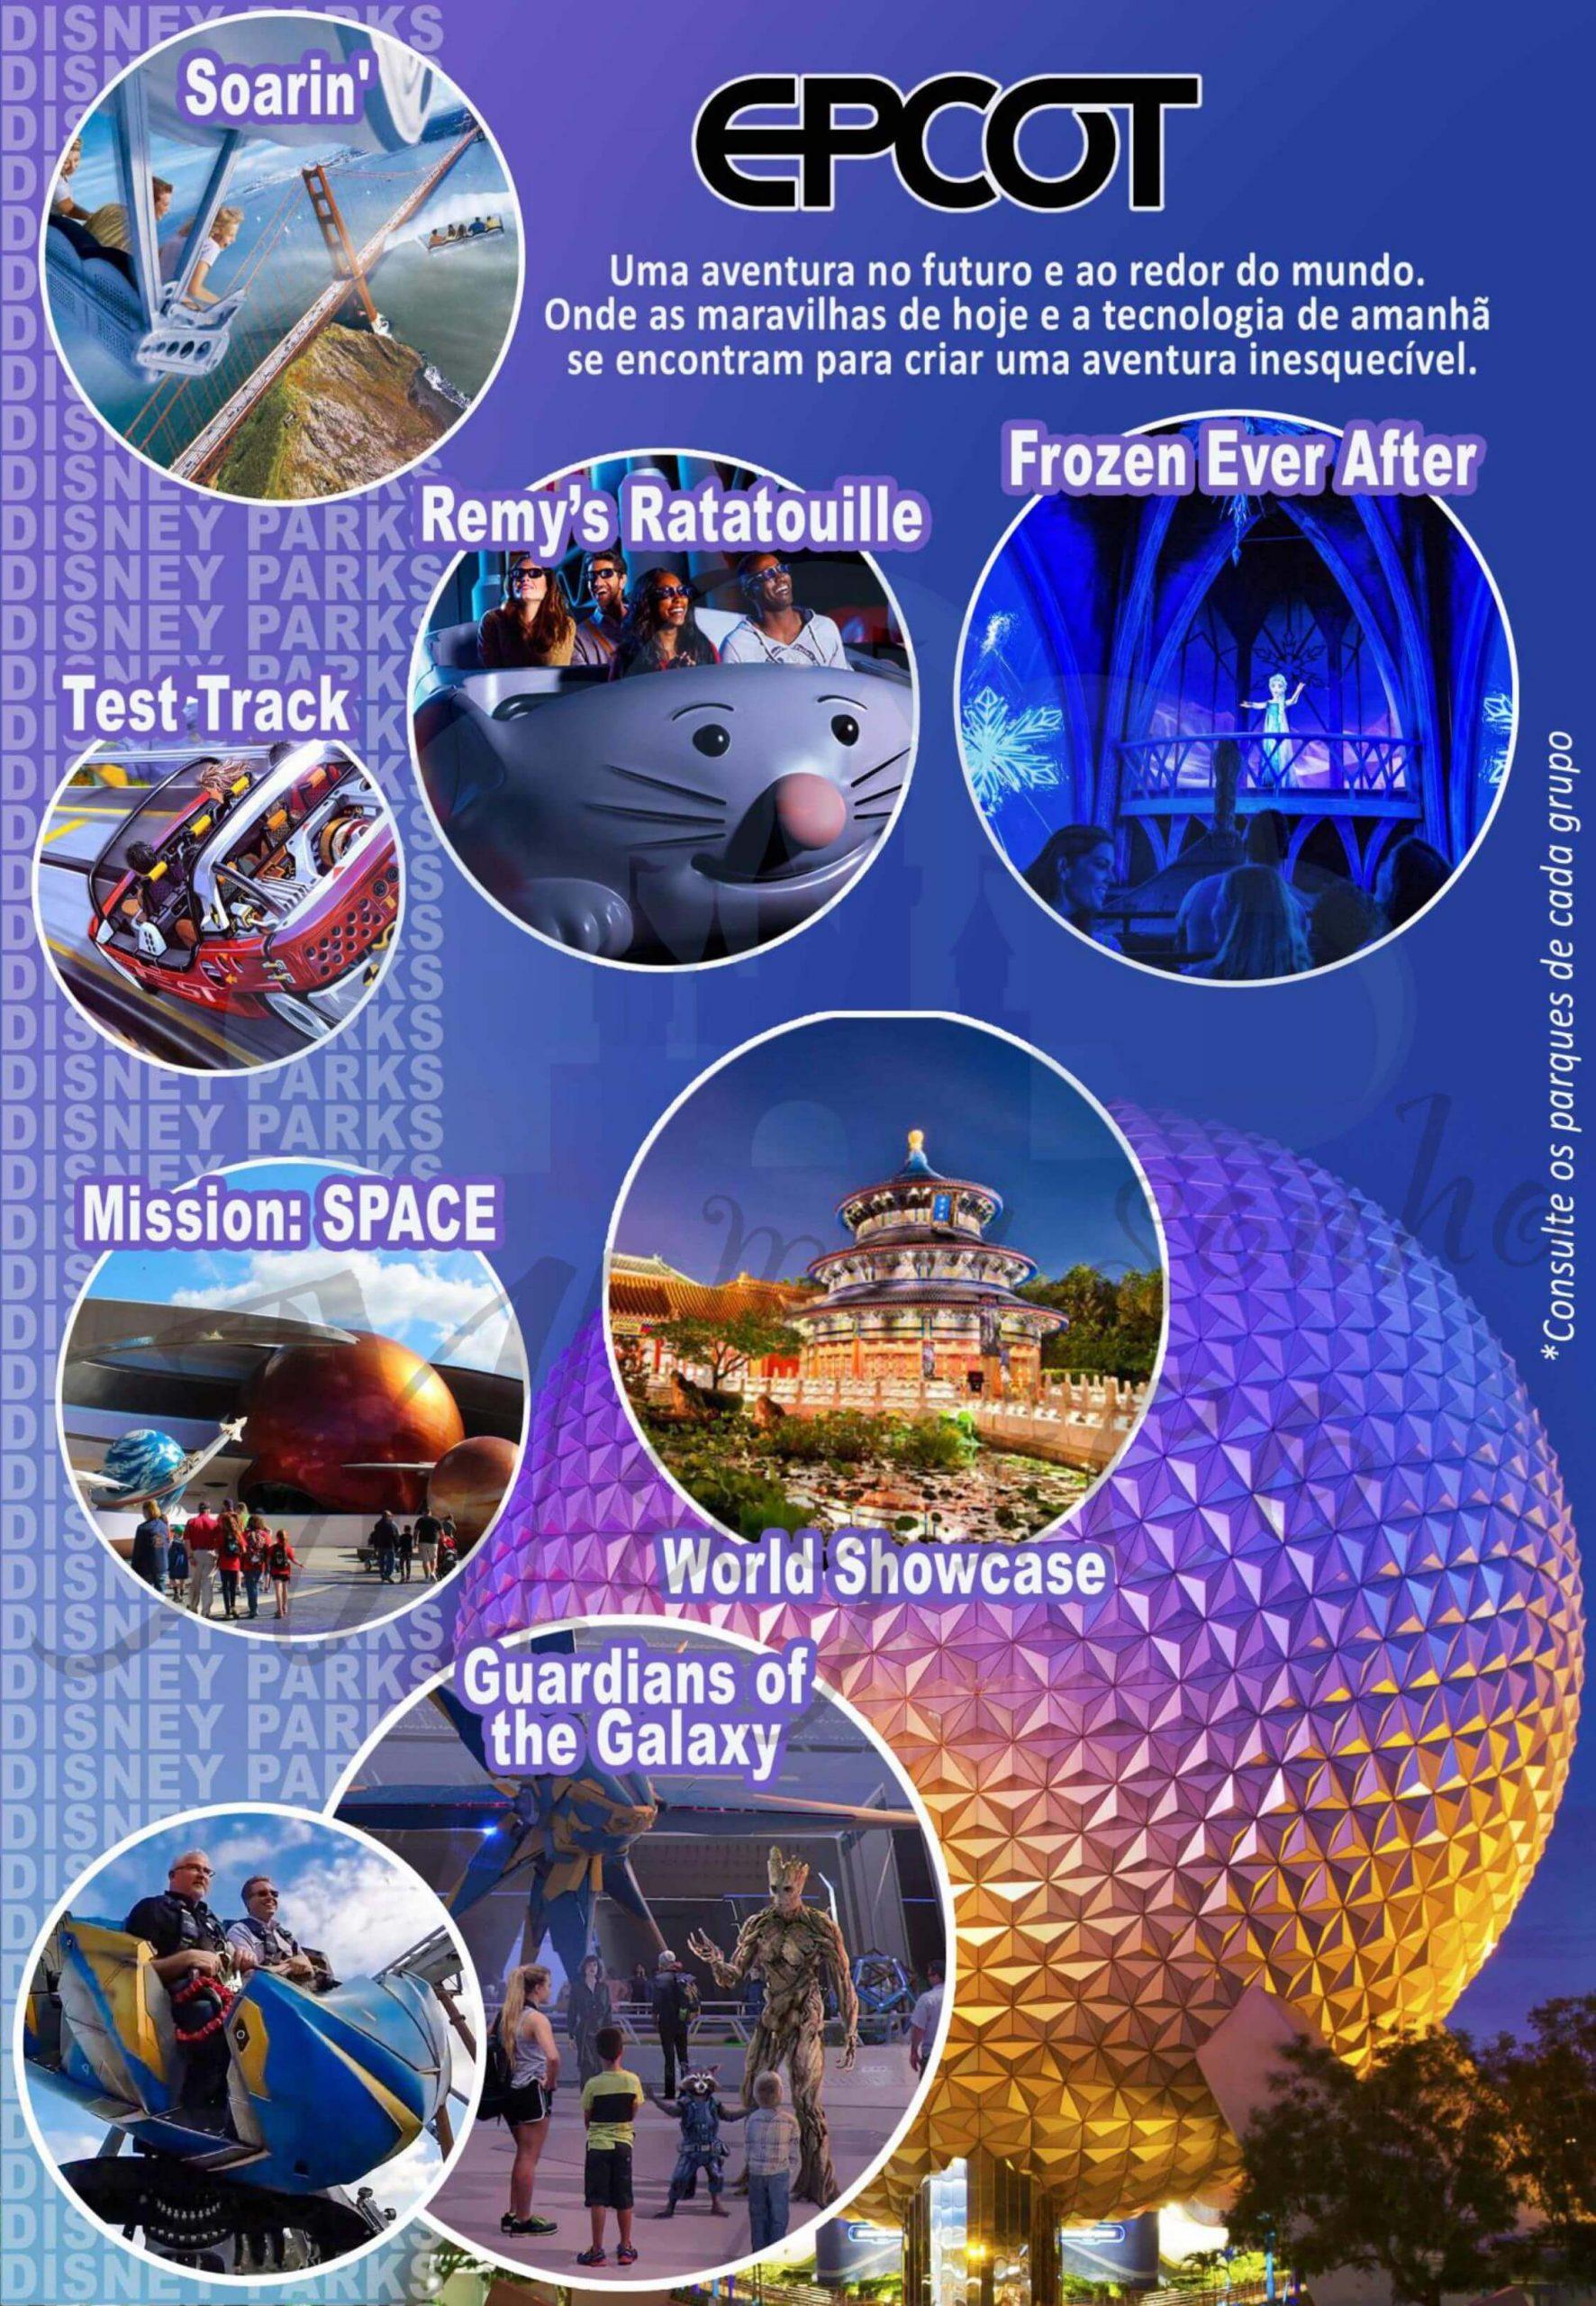 Grupo Family Natal - Disney Novembro 2023 9